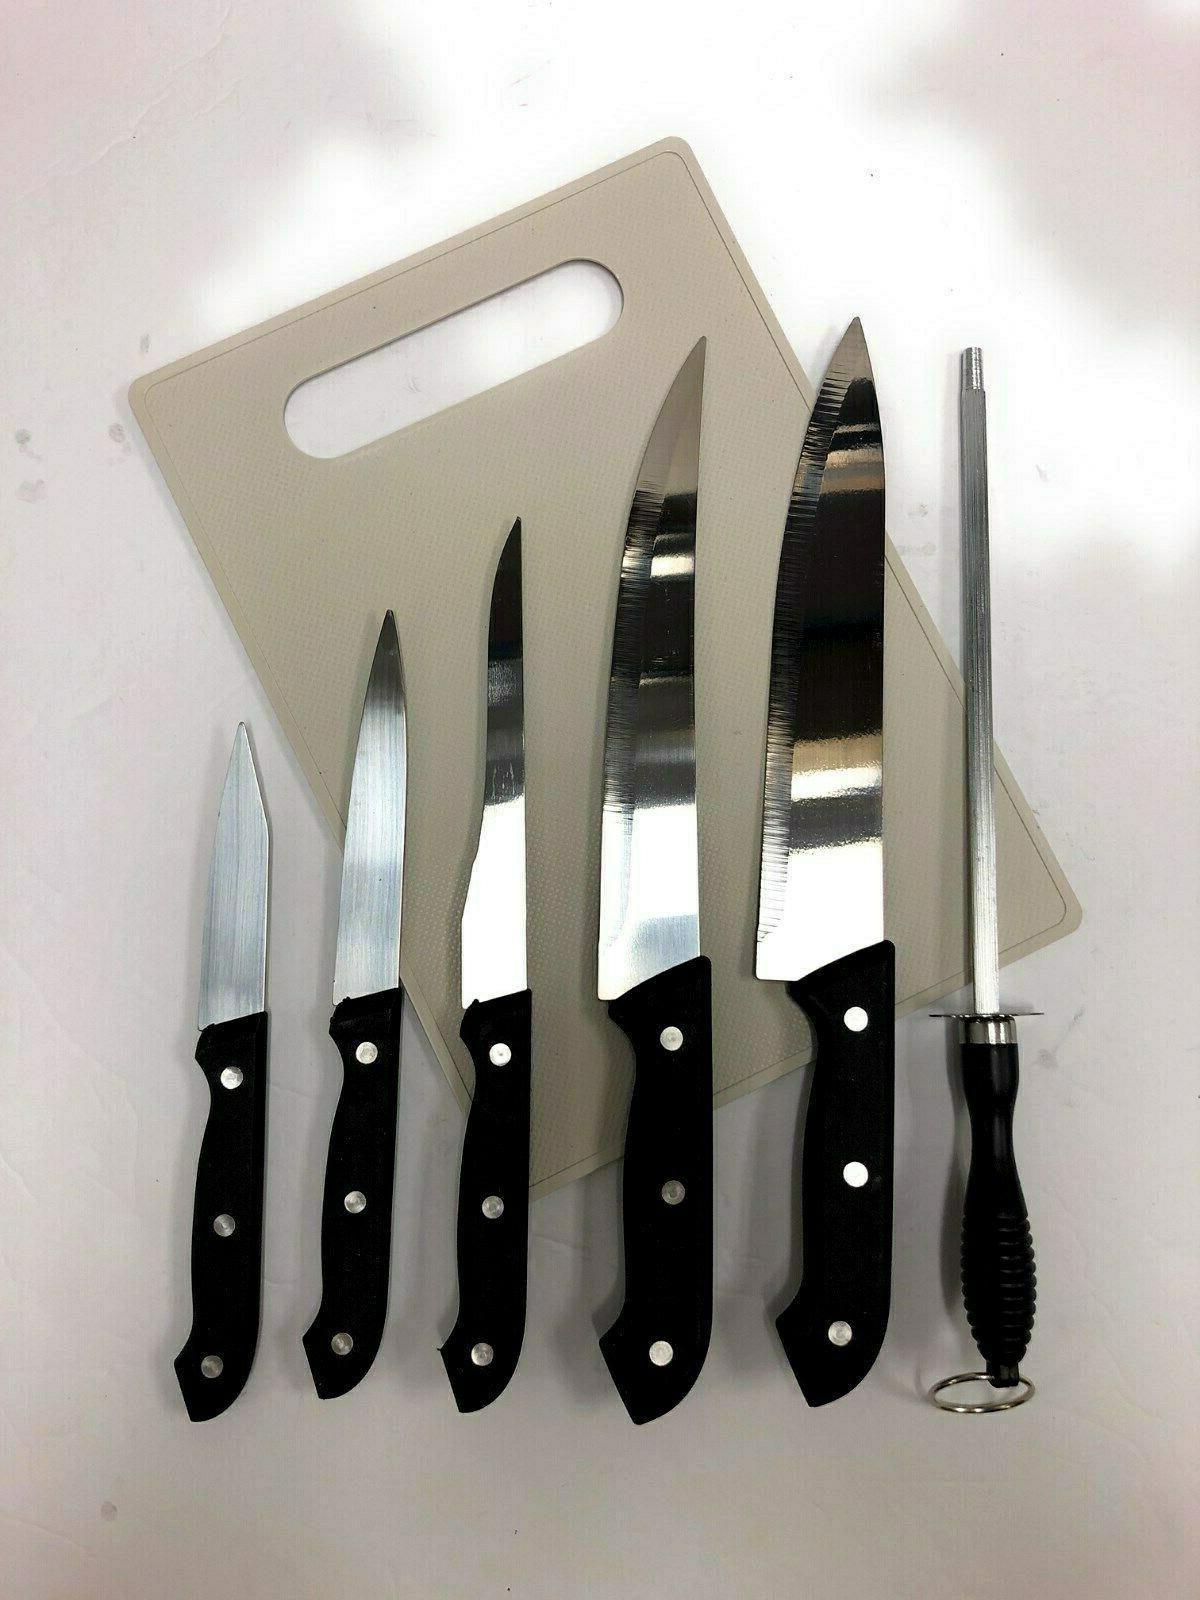 7 PC Knife Cutting Board